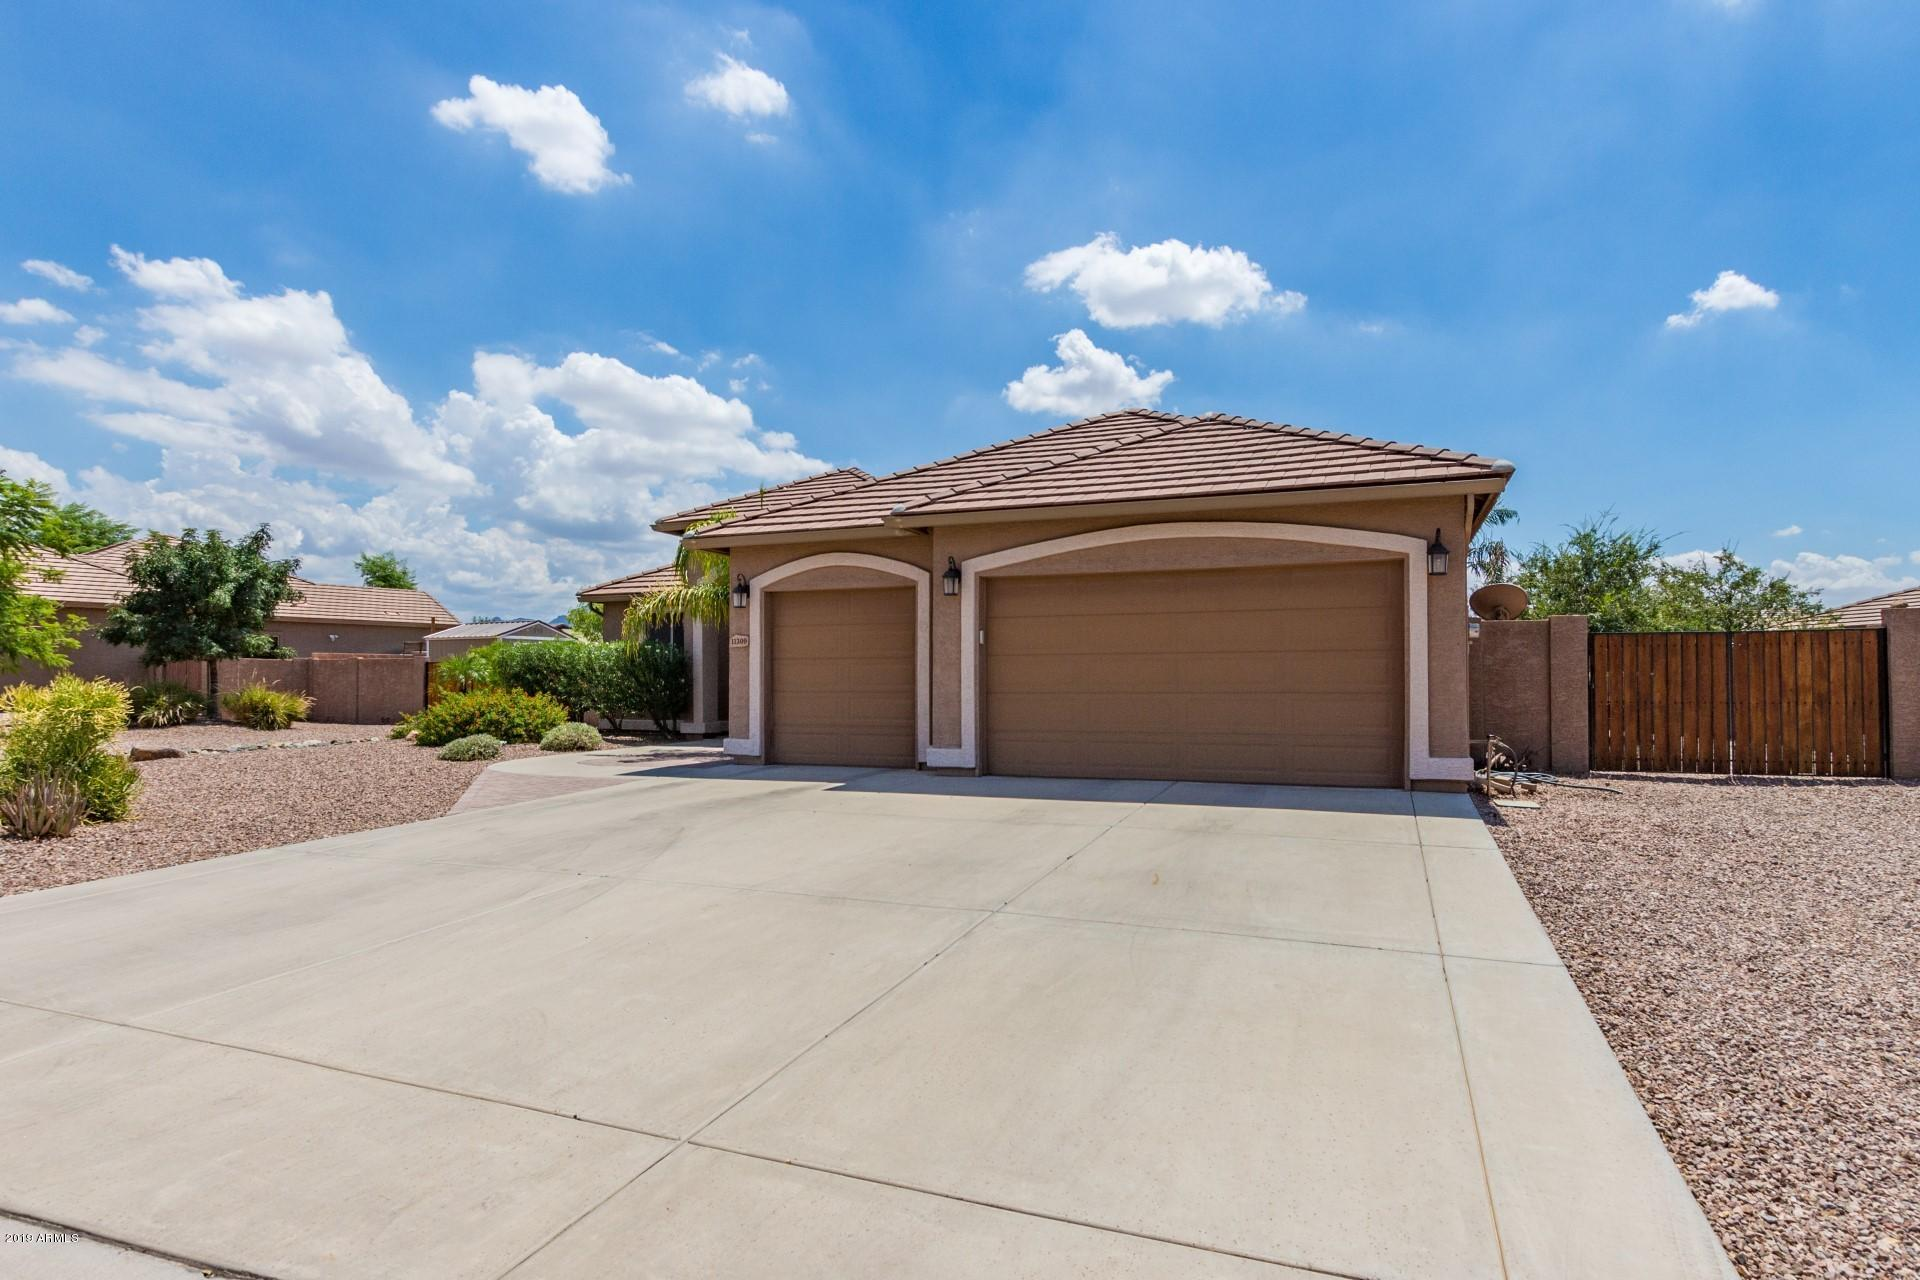 Photo of 11309 E FAIRBROOK Street, Mesa, AZ 85207